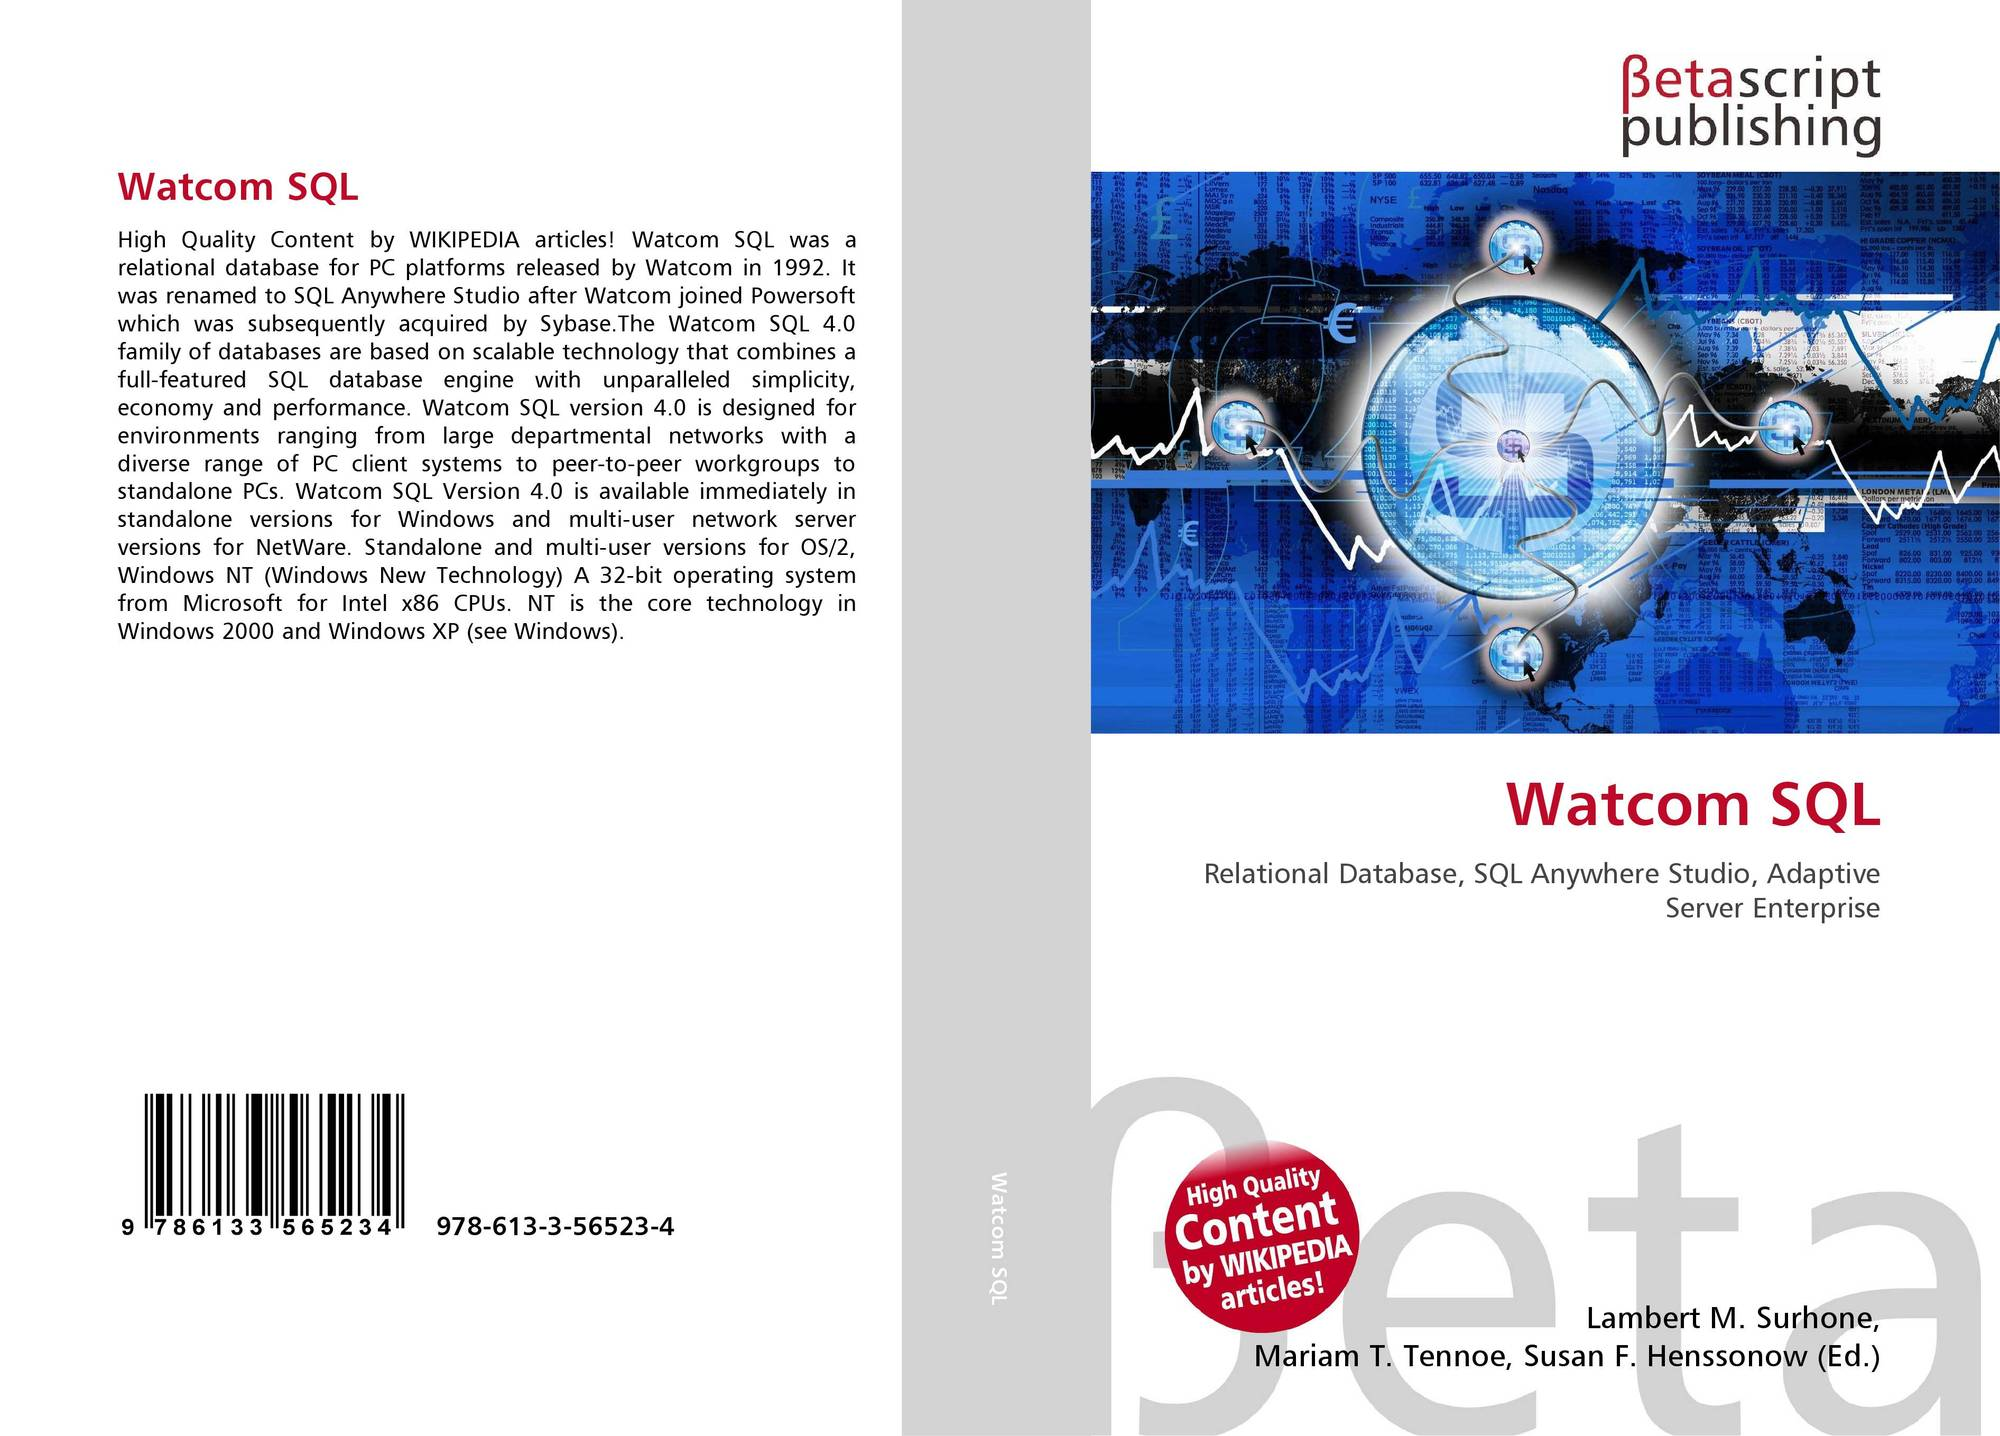 Watcom SQL, 978-613-3-56523-4,...